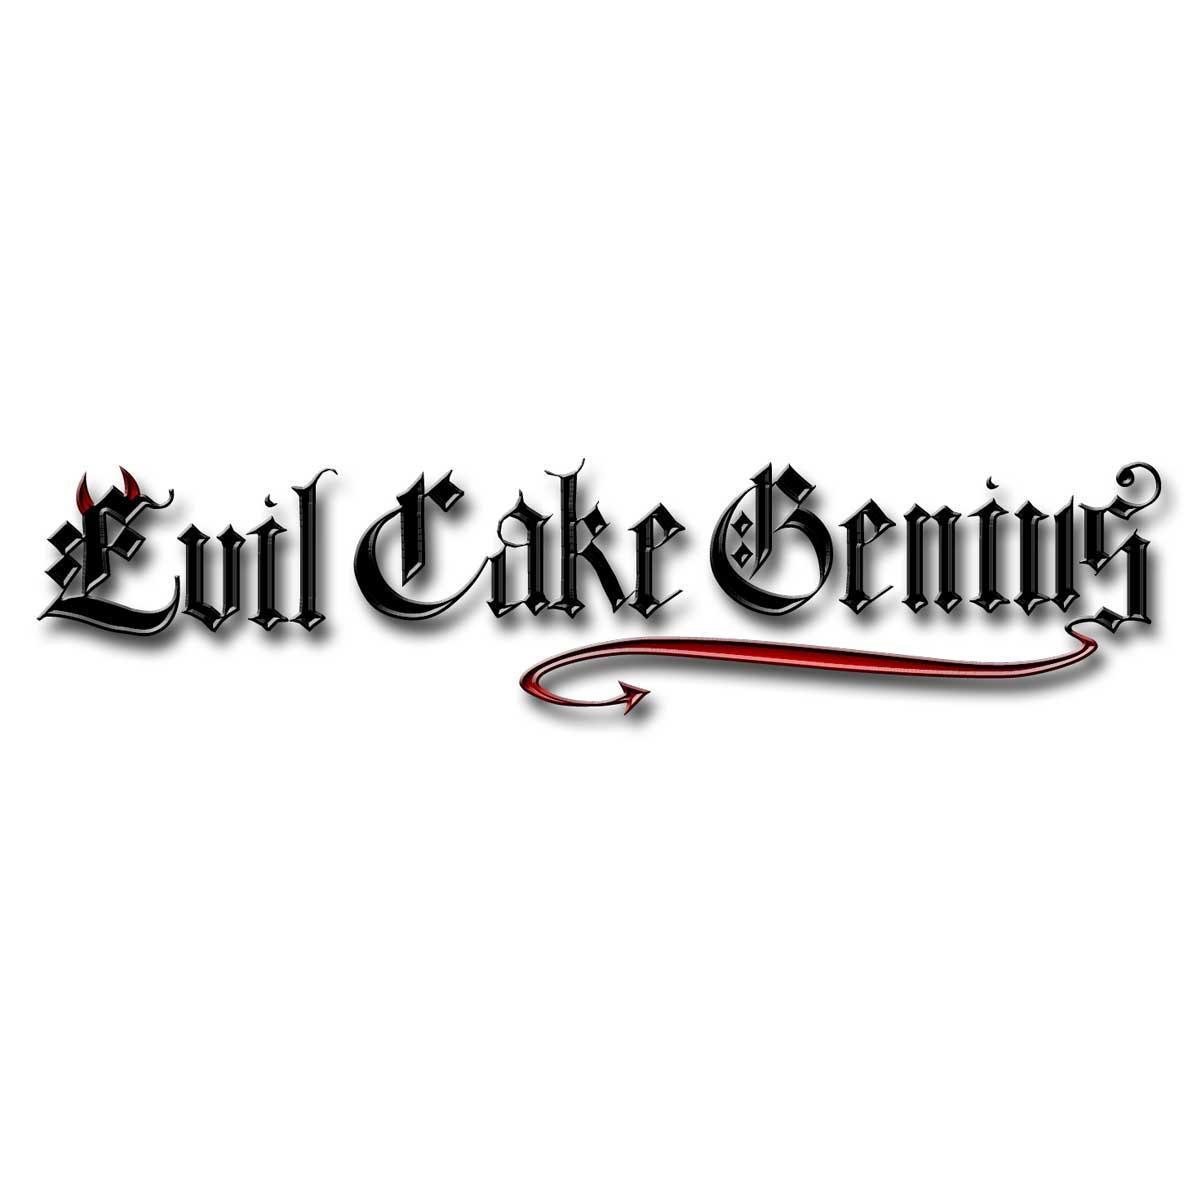 Traditional Monogram Deluxe Two Alphabet Set Evil Cake